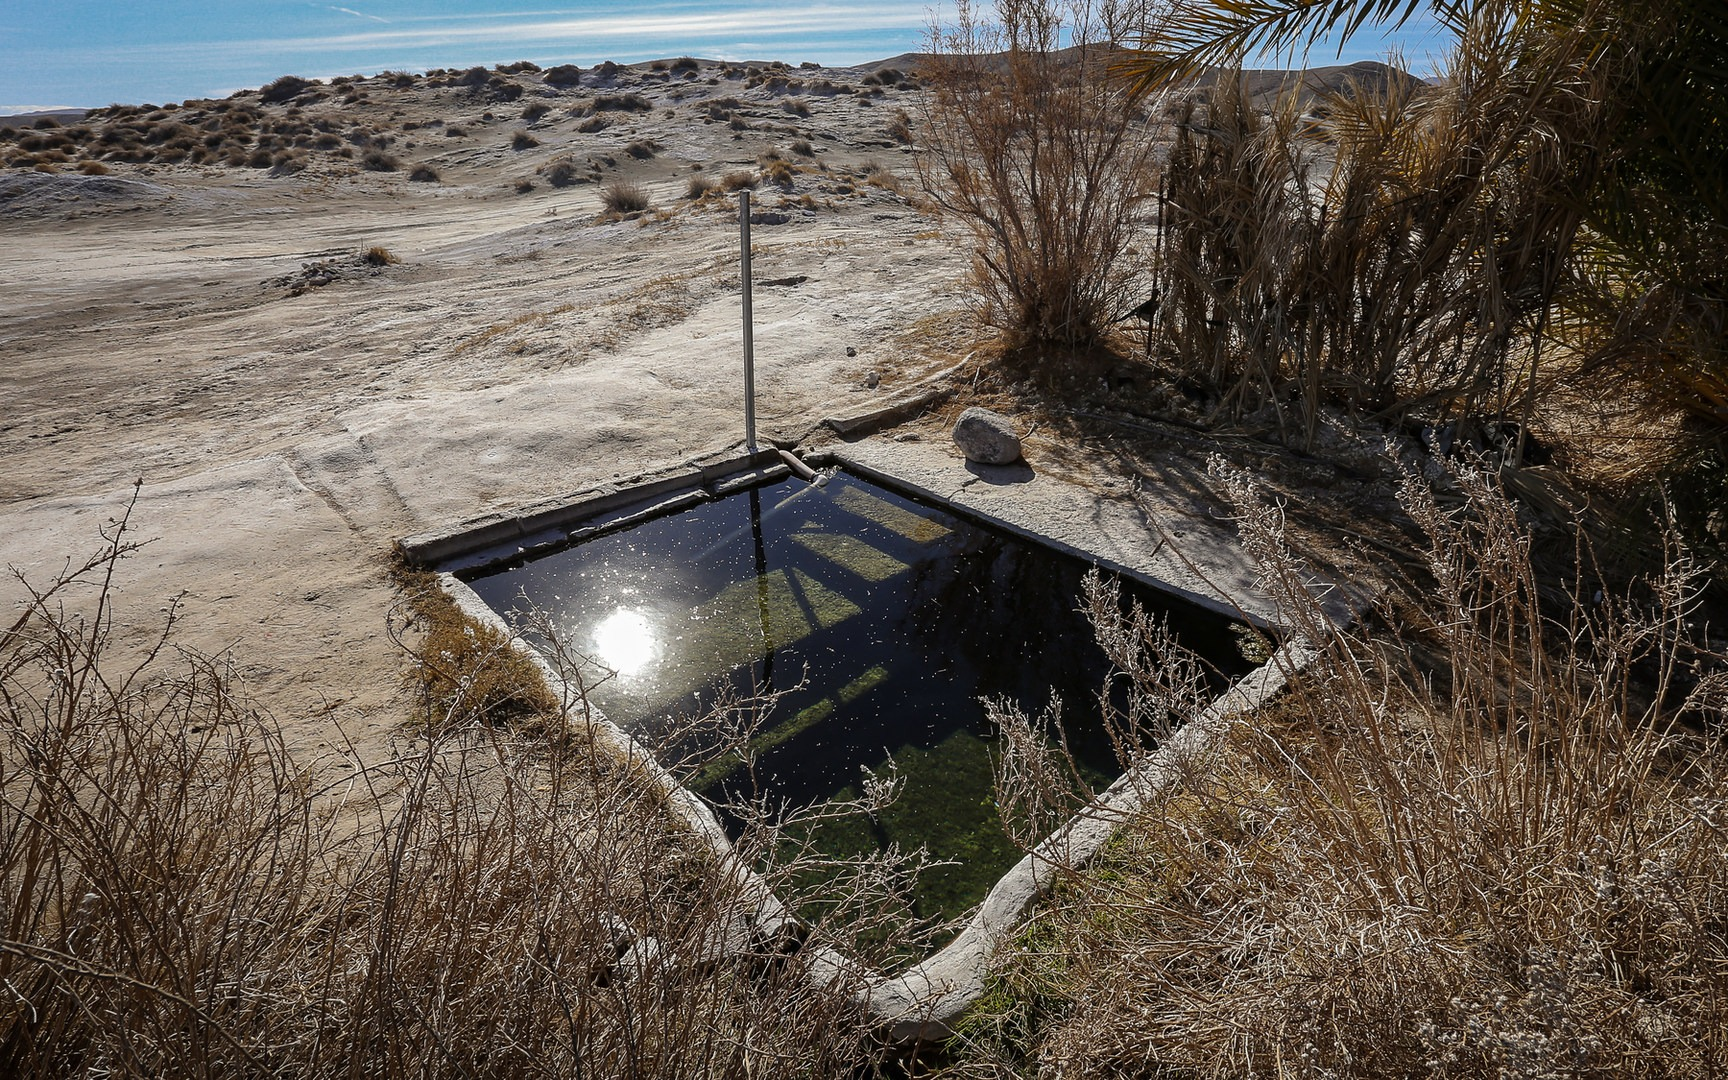 Tecopa Hot Tub - hot springs in California